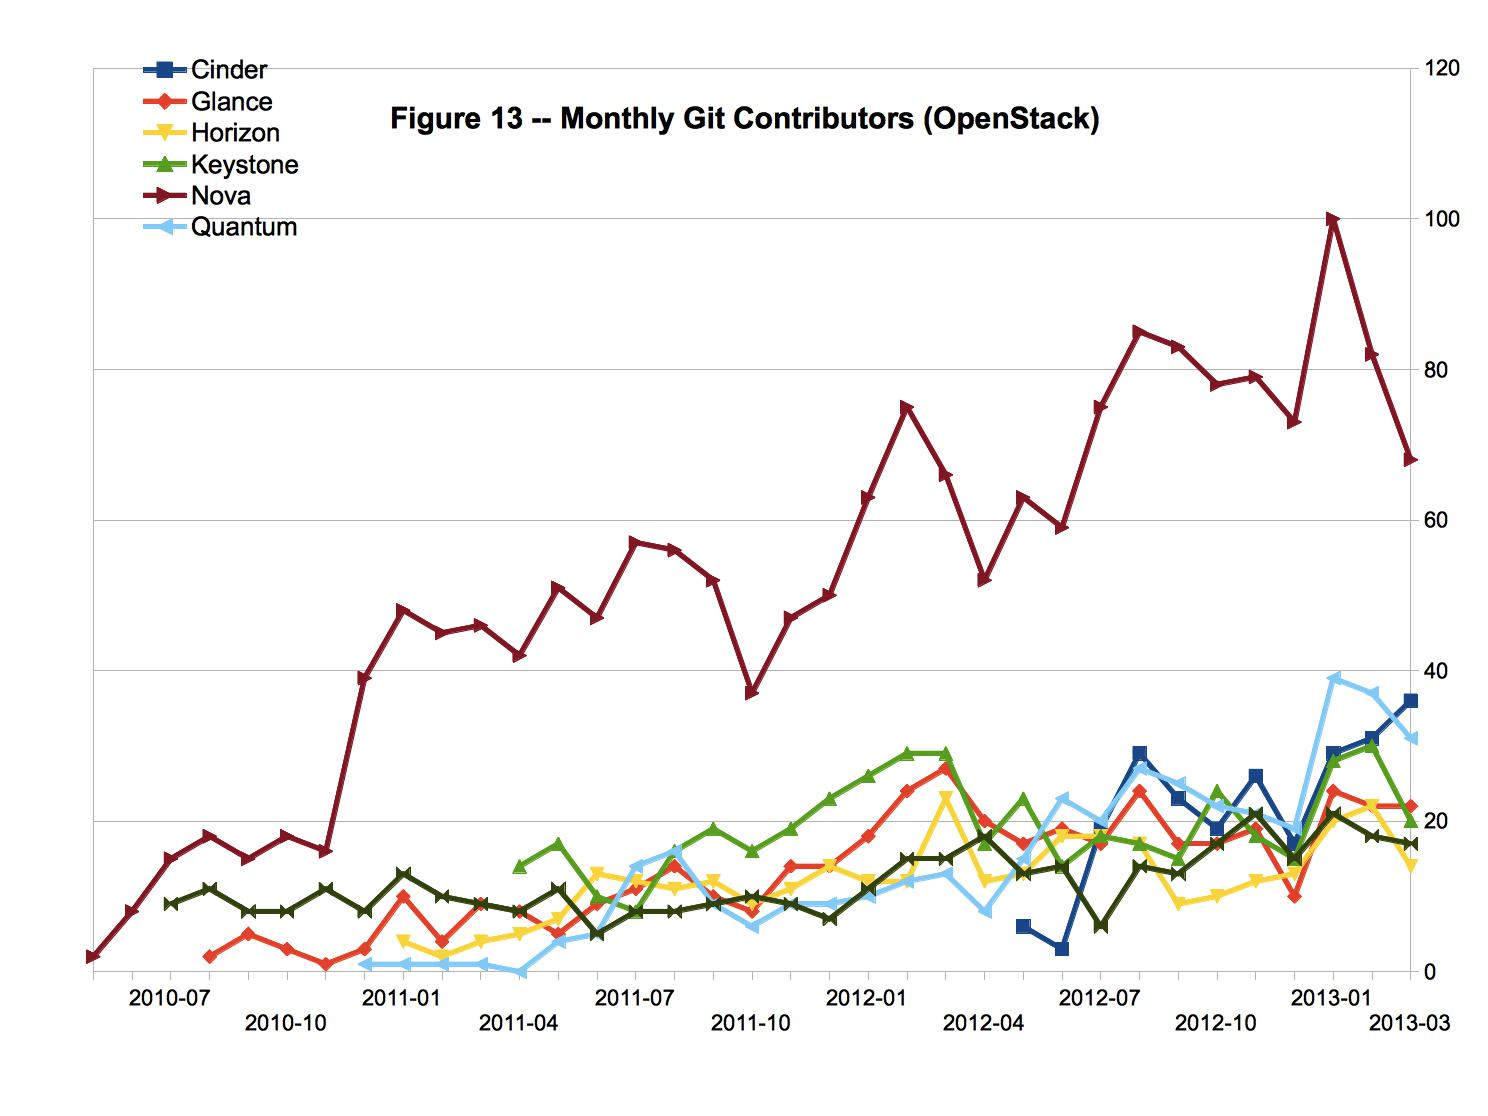 婉兮清扬 » CY13-Q1 Community Analysis — OpenStack vs